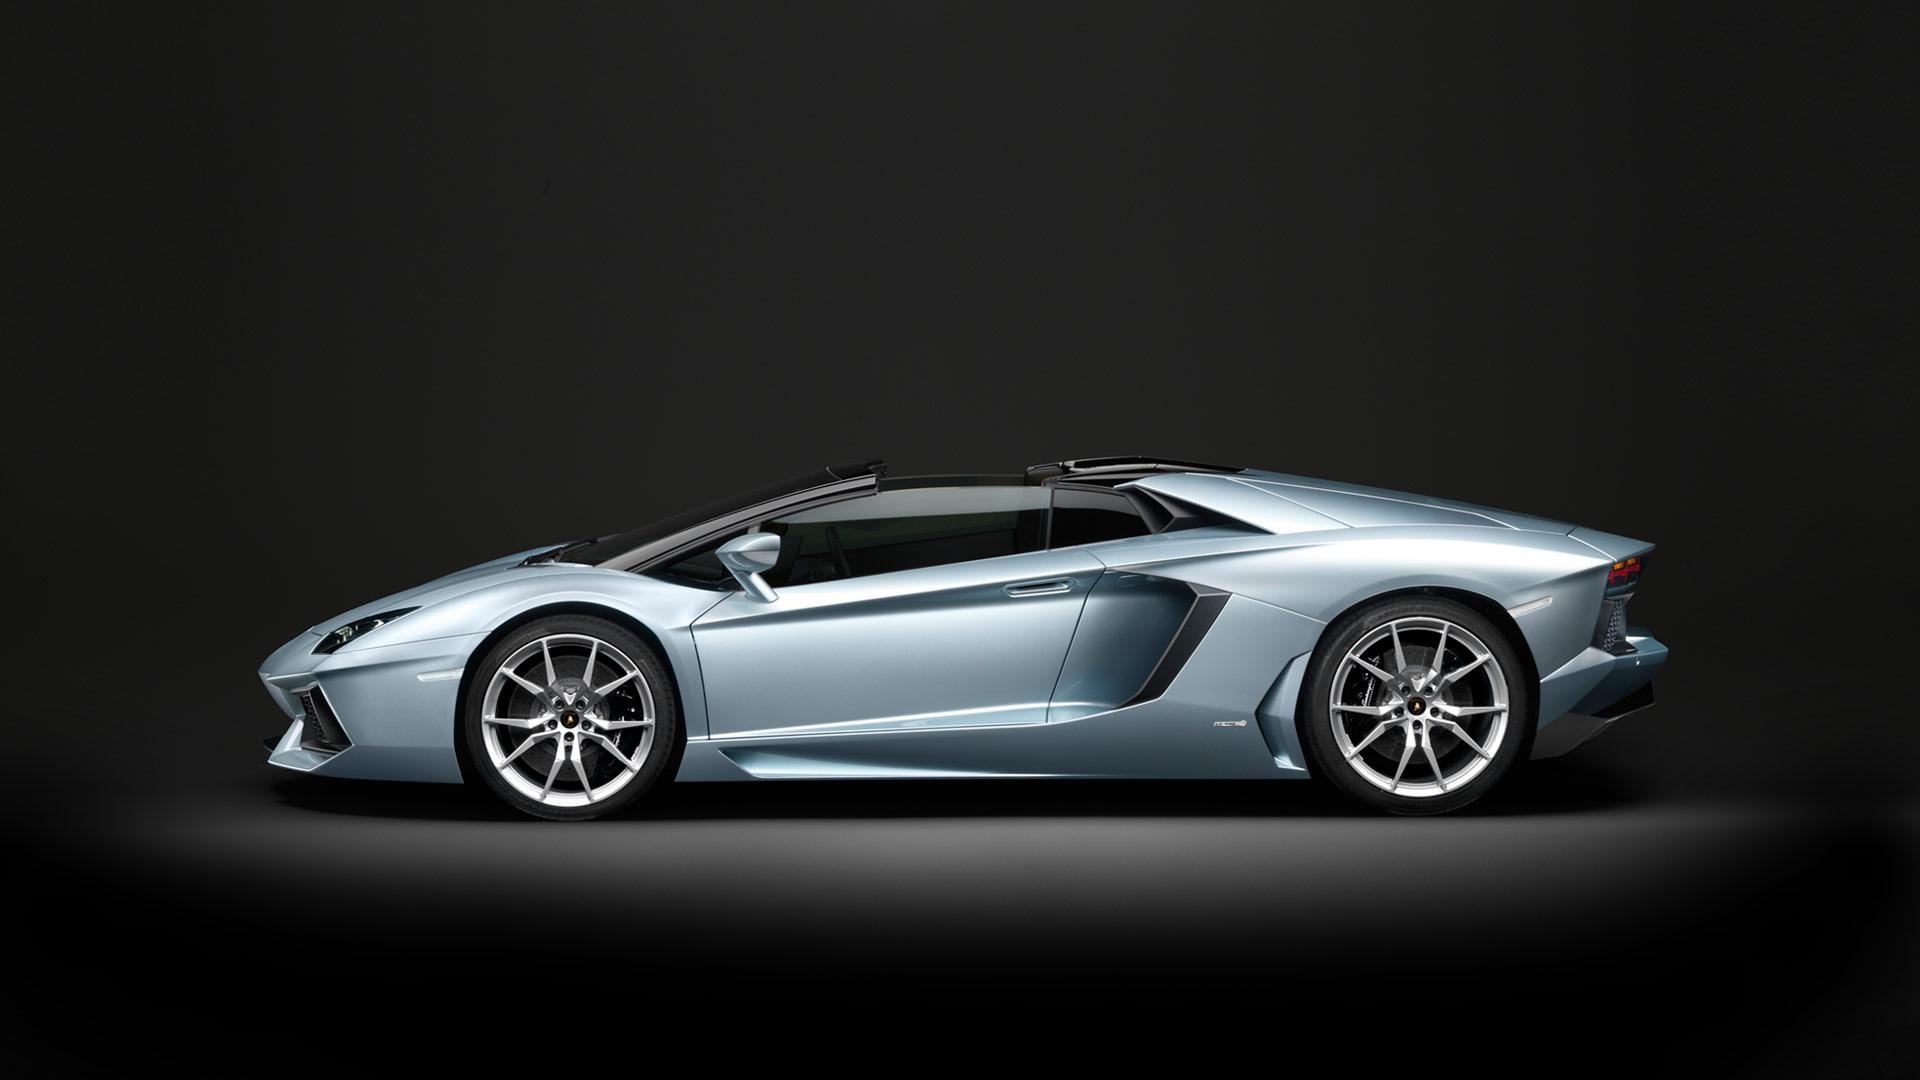 2013 Lamborghini LP700